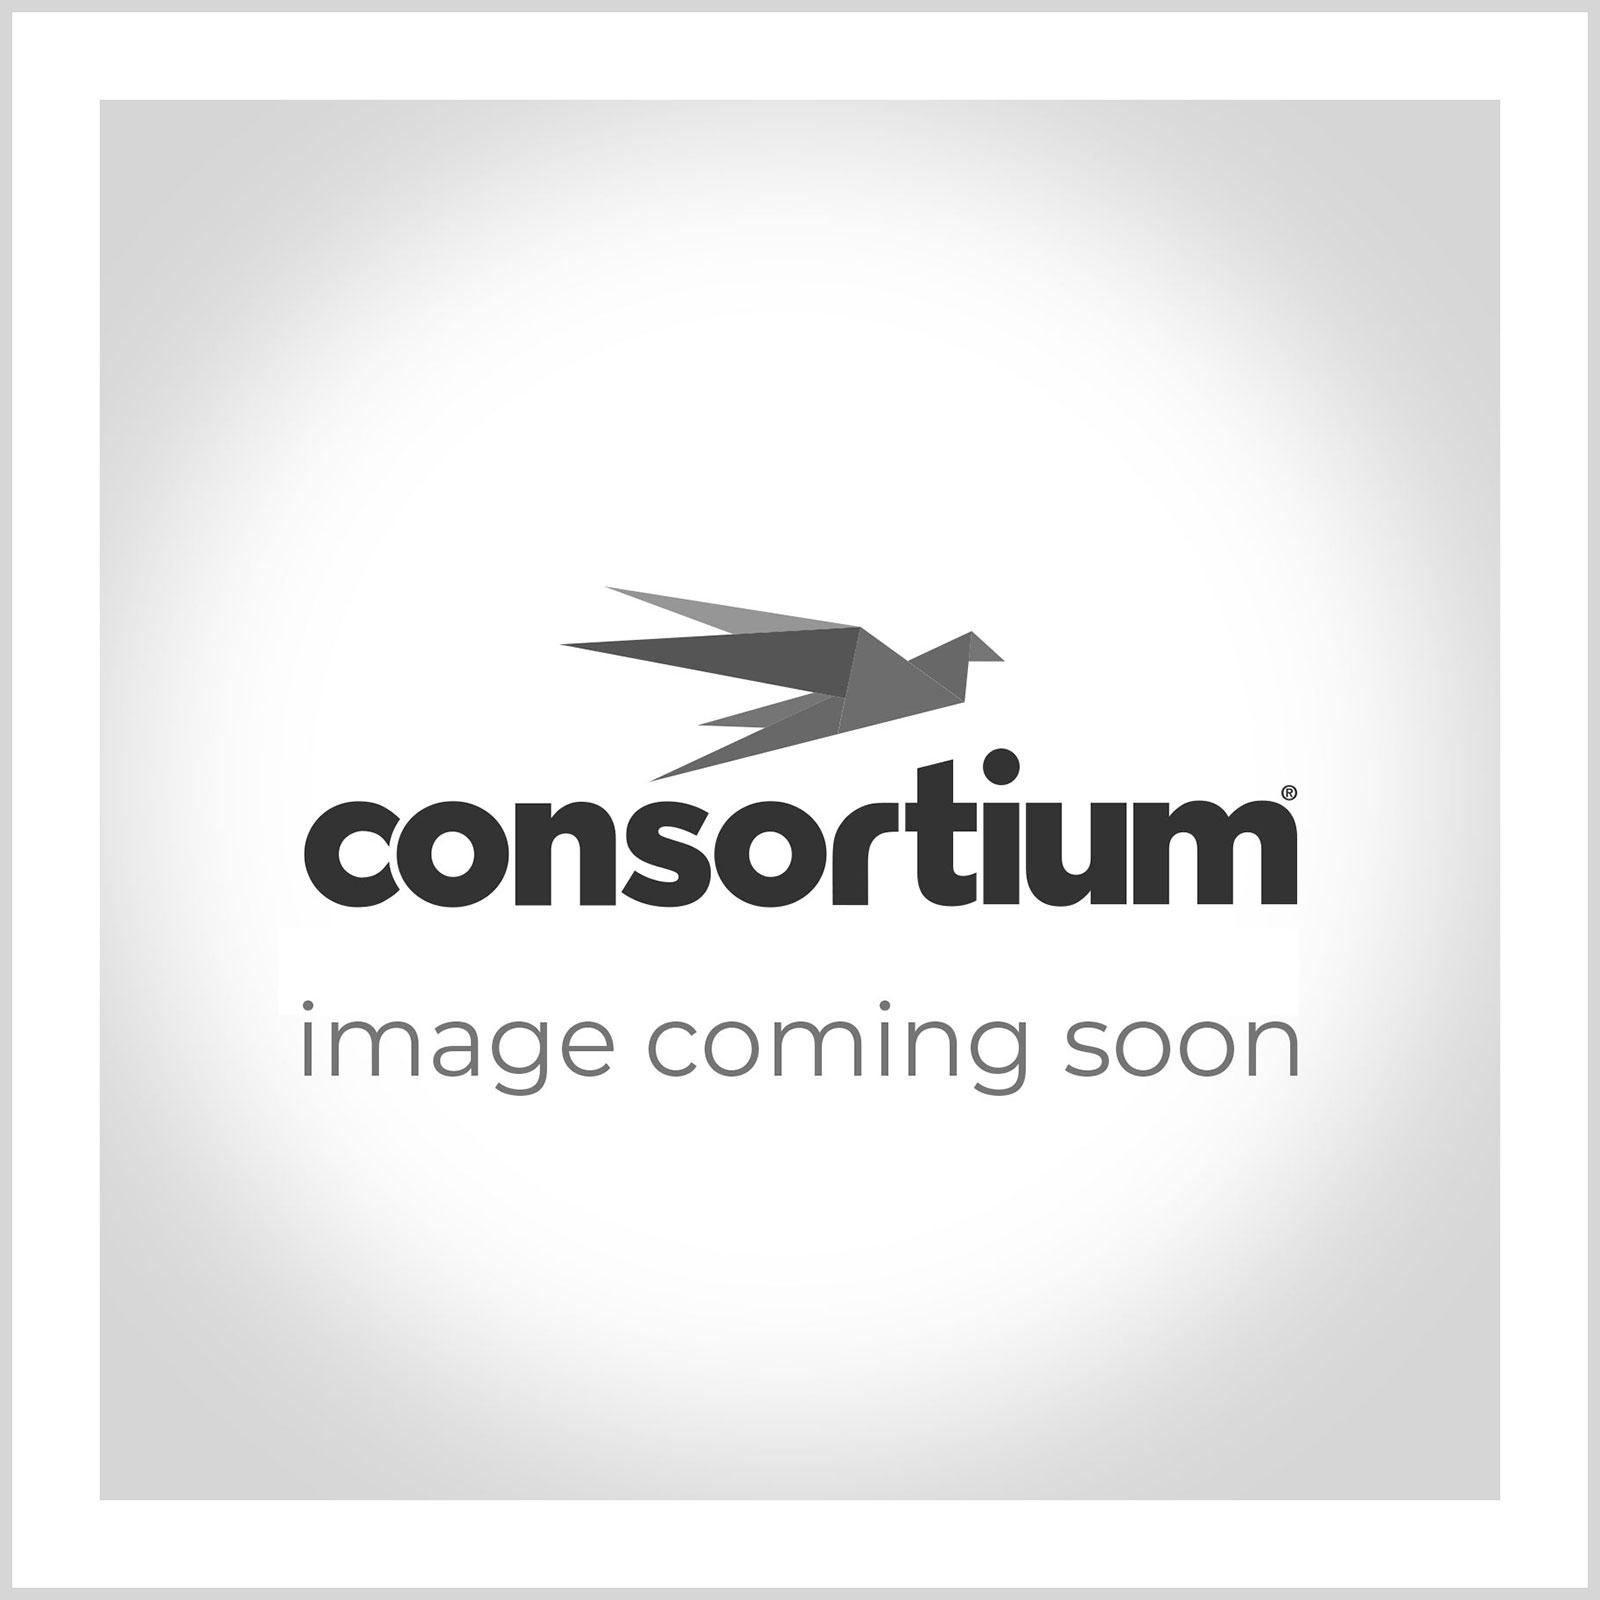 Abrasive Sponge Scourers